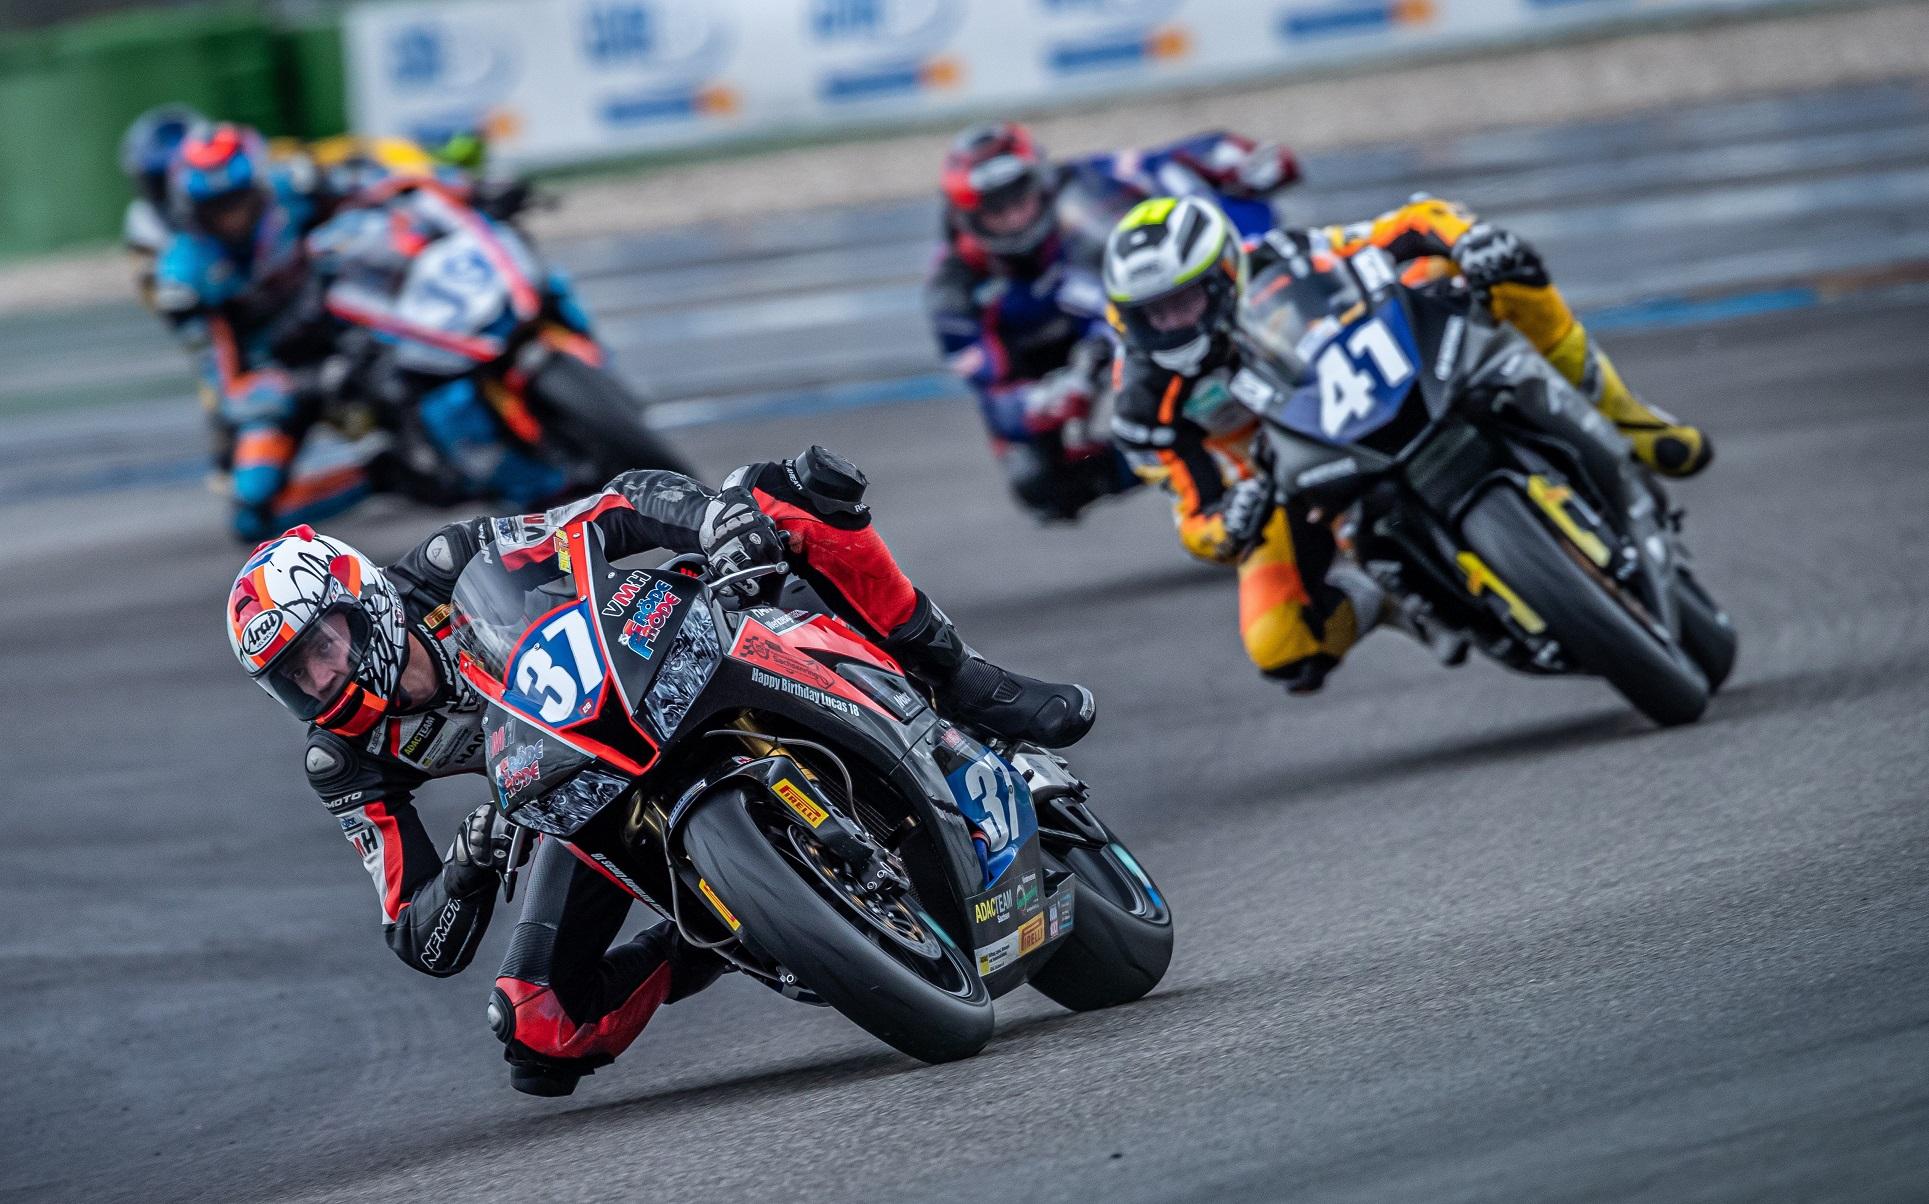 IDM STK 600: Fröde auf Stocksport-Honda statt Superbike